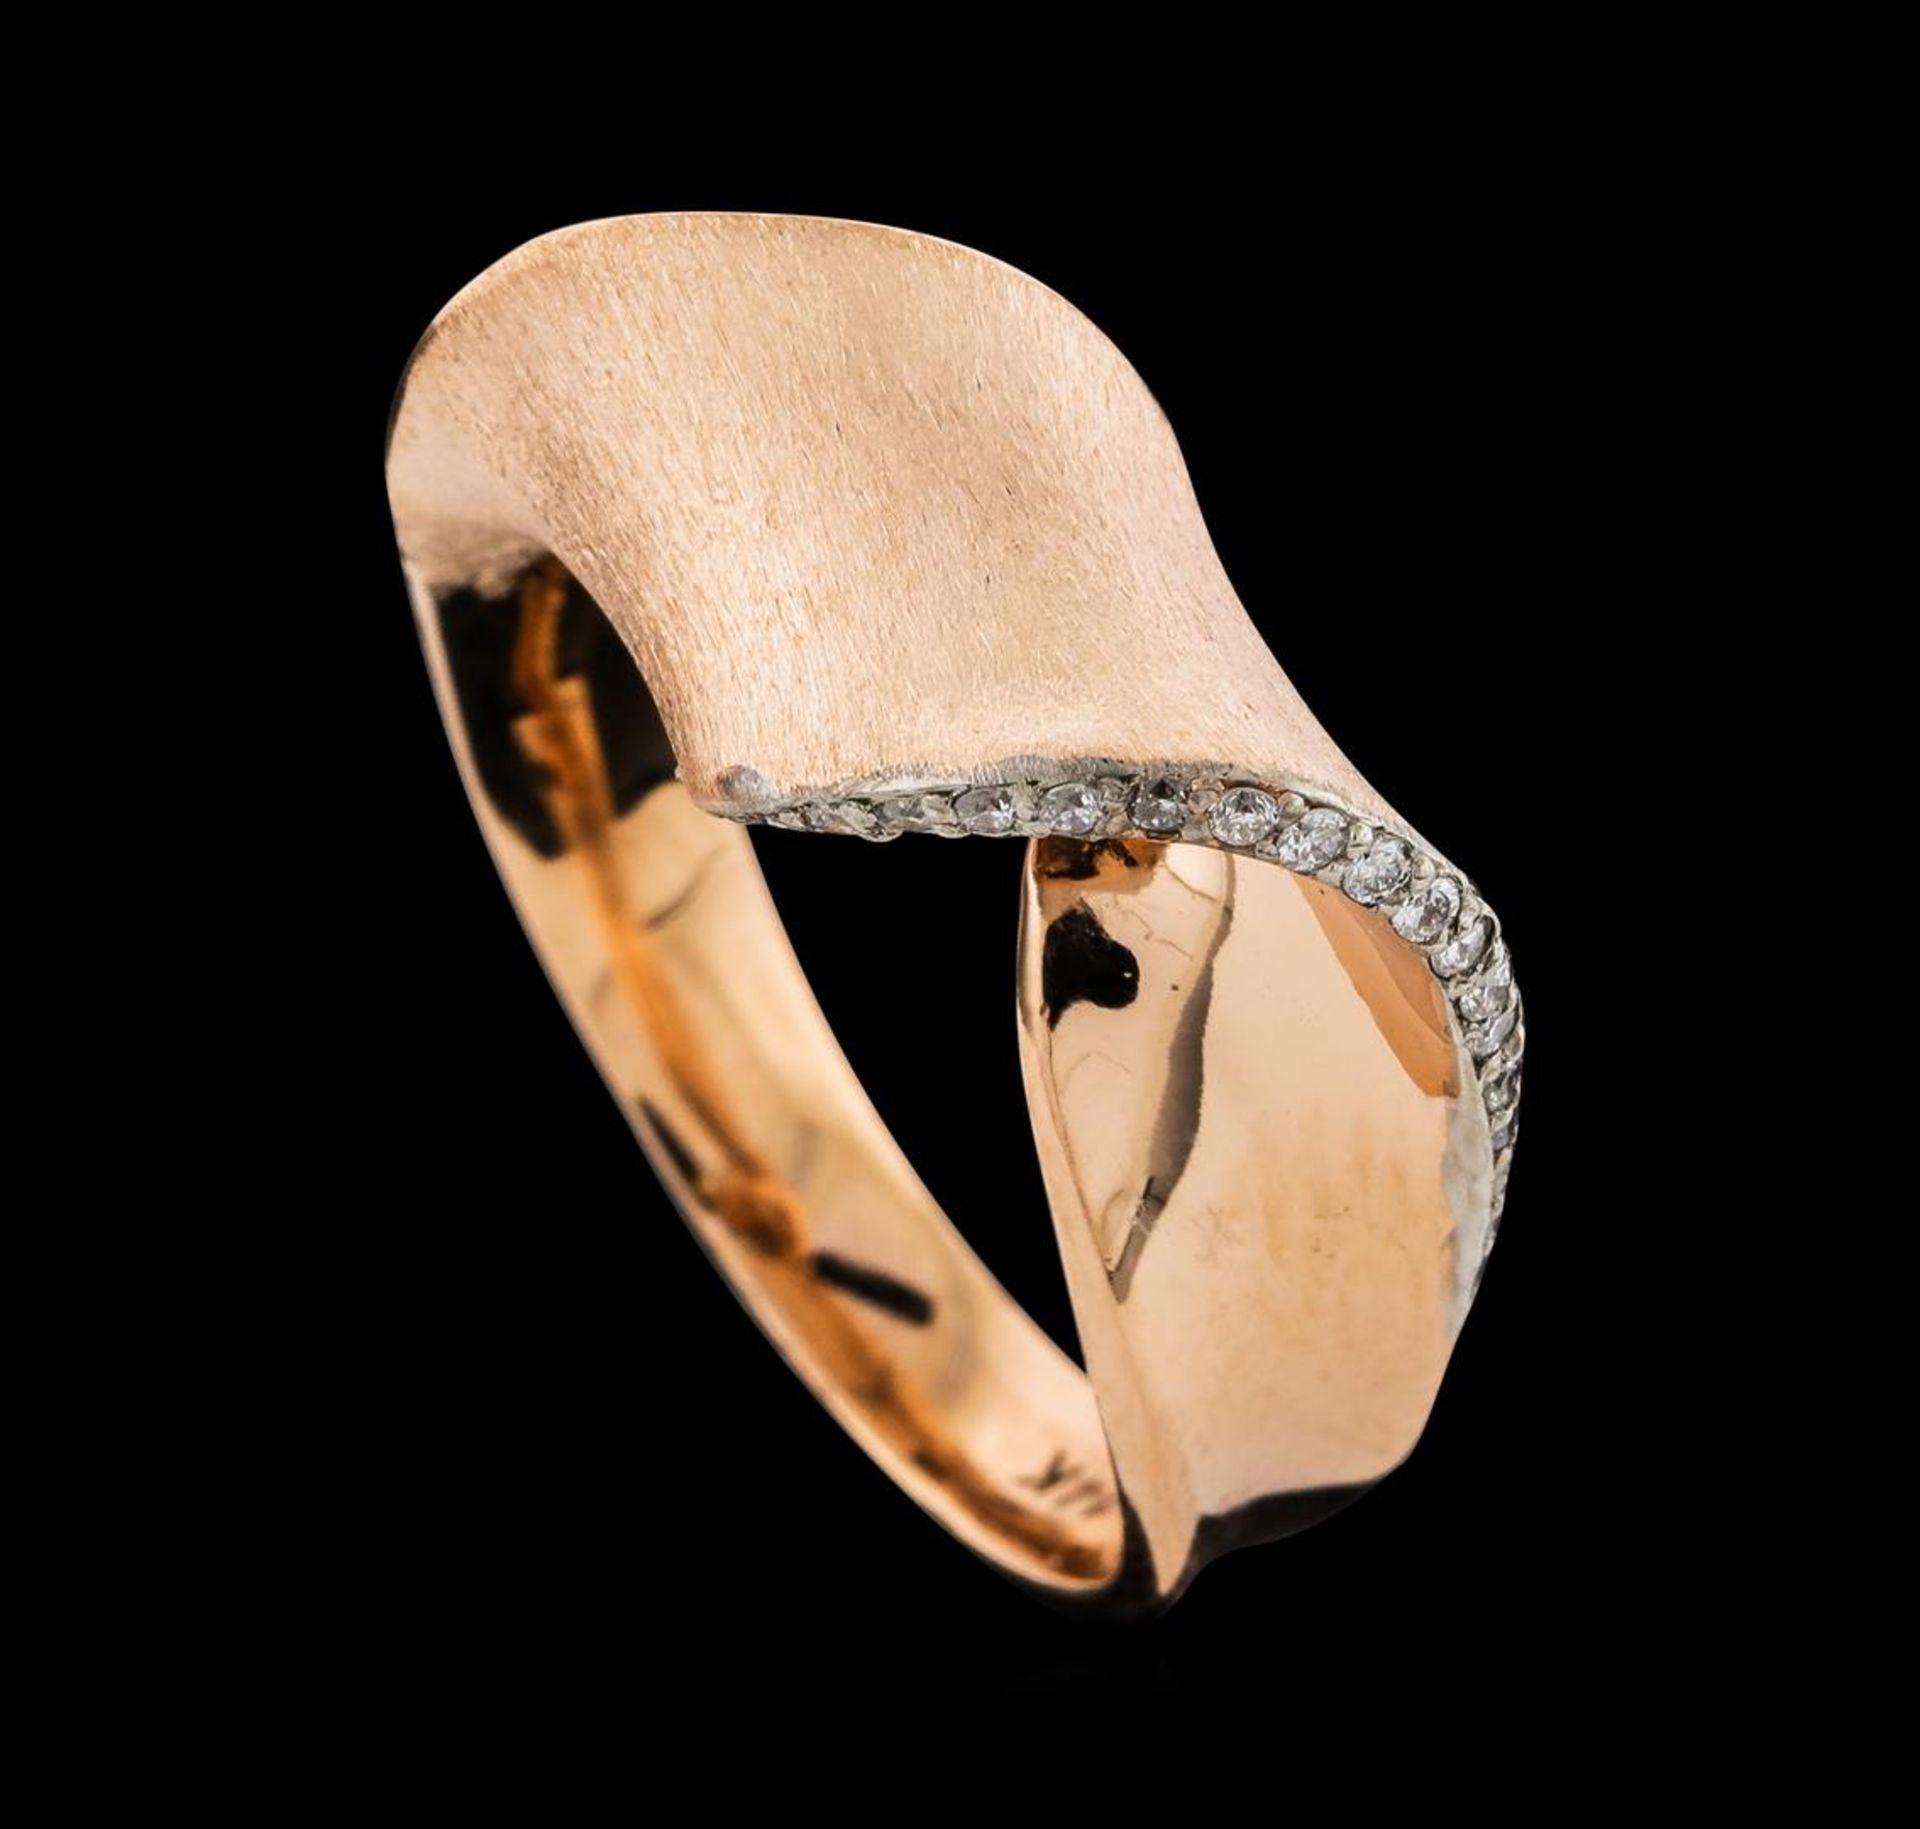 0.15 ctw Diamond Ring - 14KT Rose Gold - Image 4 of 4